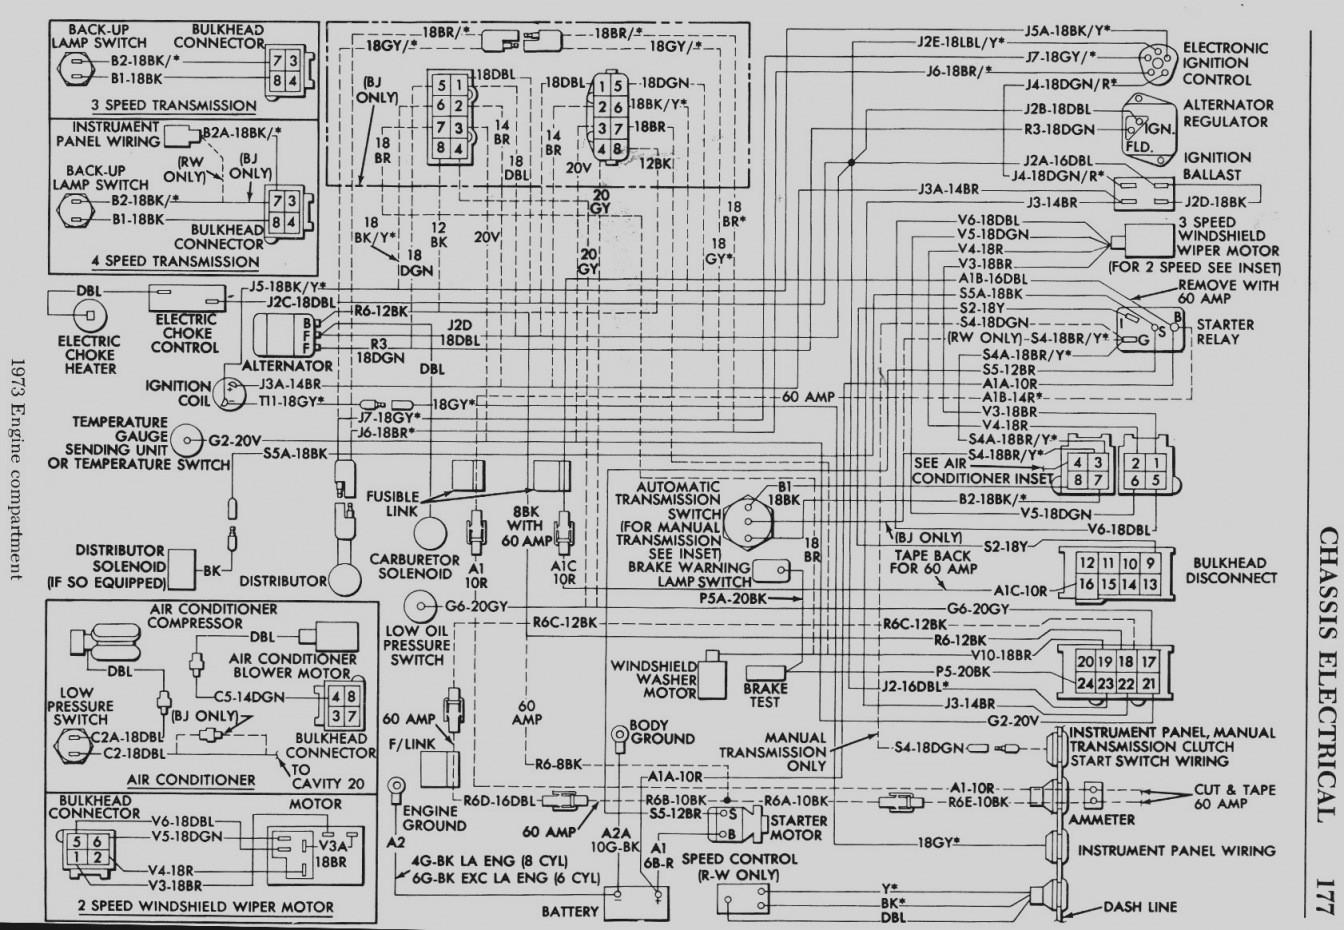 Astonishing 1972 Dodge Dart Wiring Harness Basic Electronics Wiring Diagram Wiring Cloud Orsalboapumohammedshrineorg